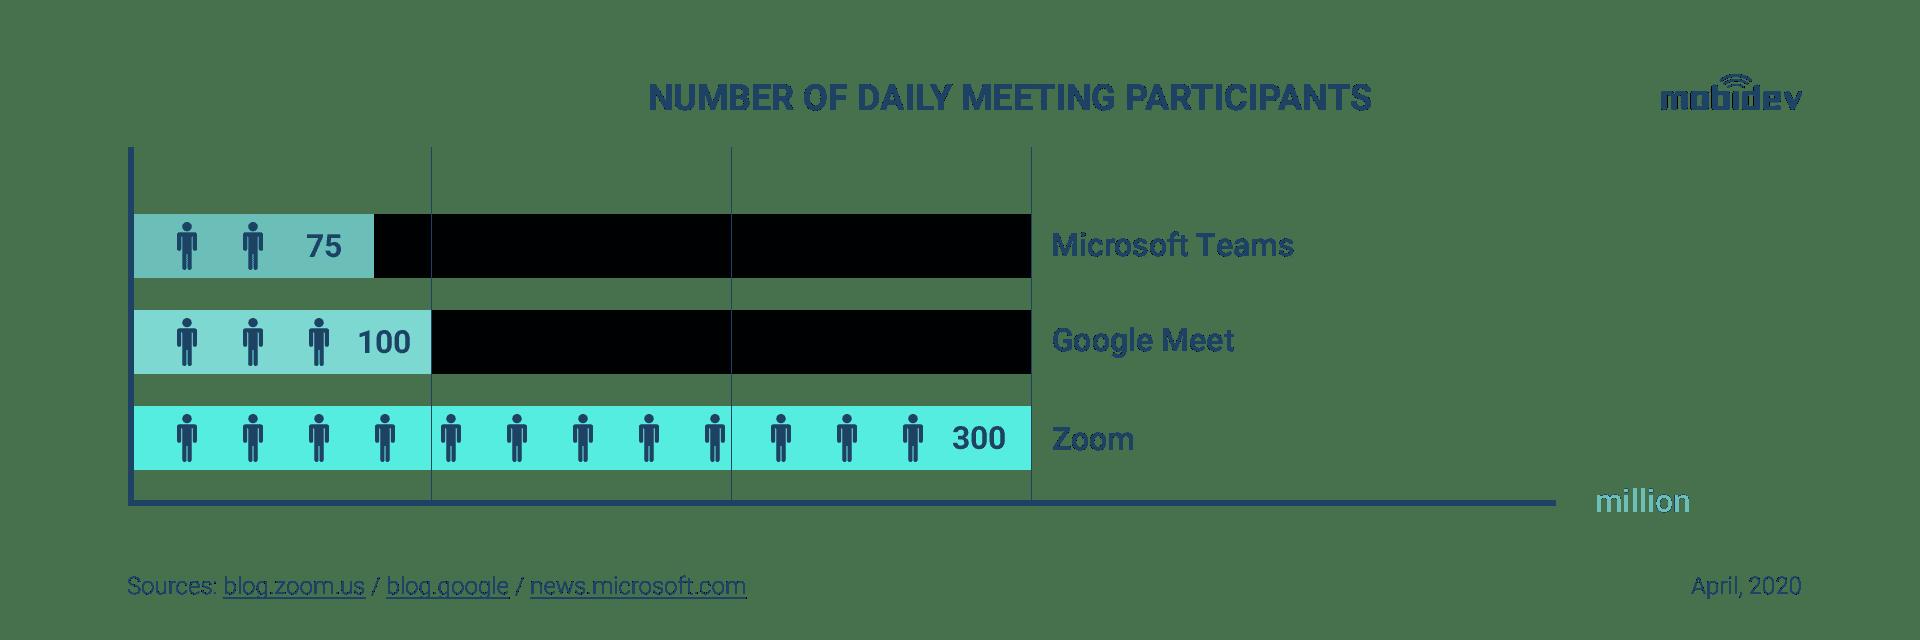 Daily users (Zoom, Google Meet, Microsoft Teams)